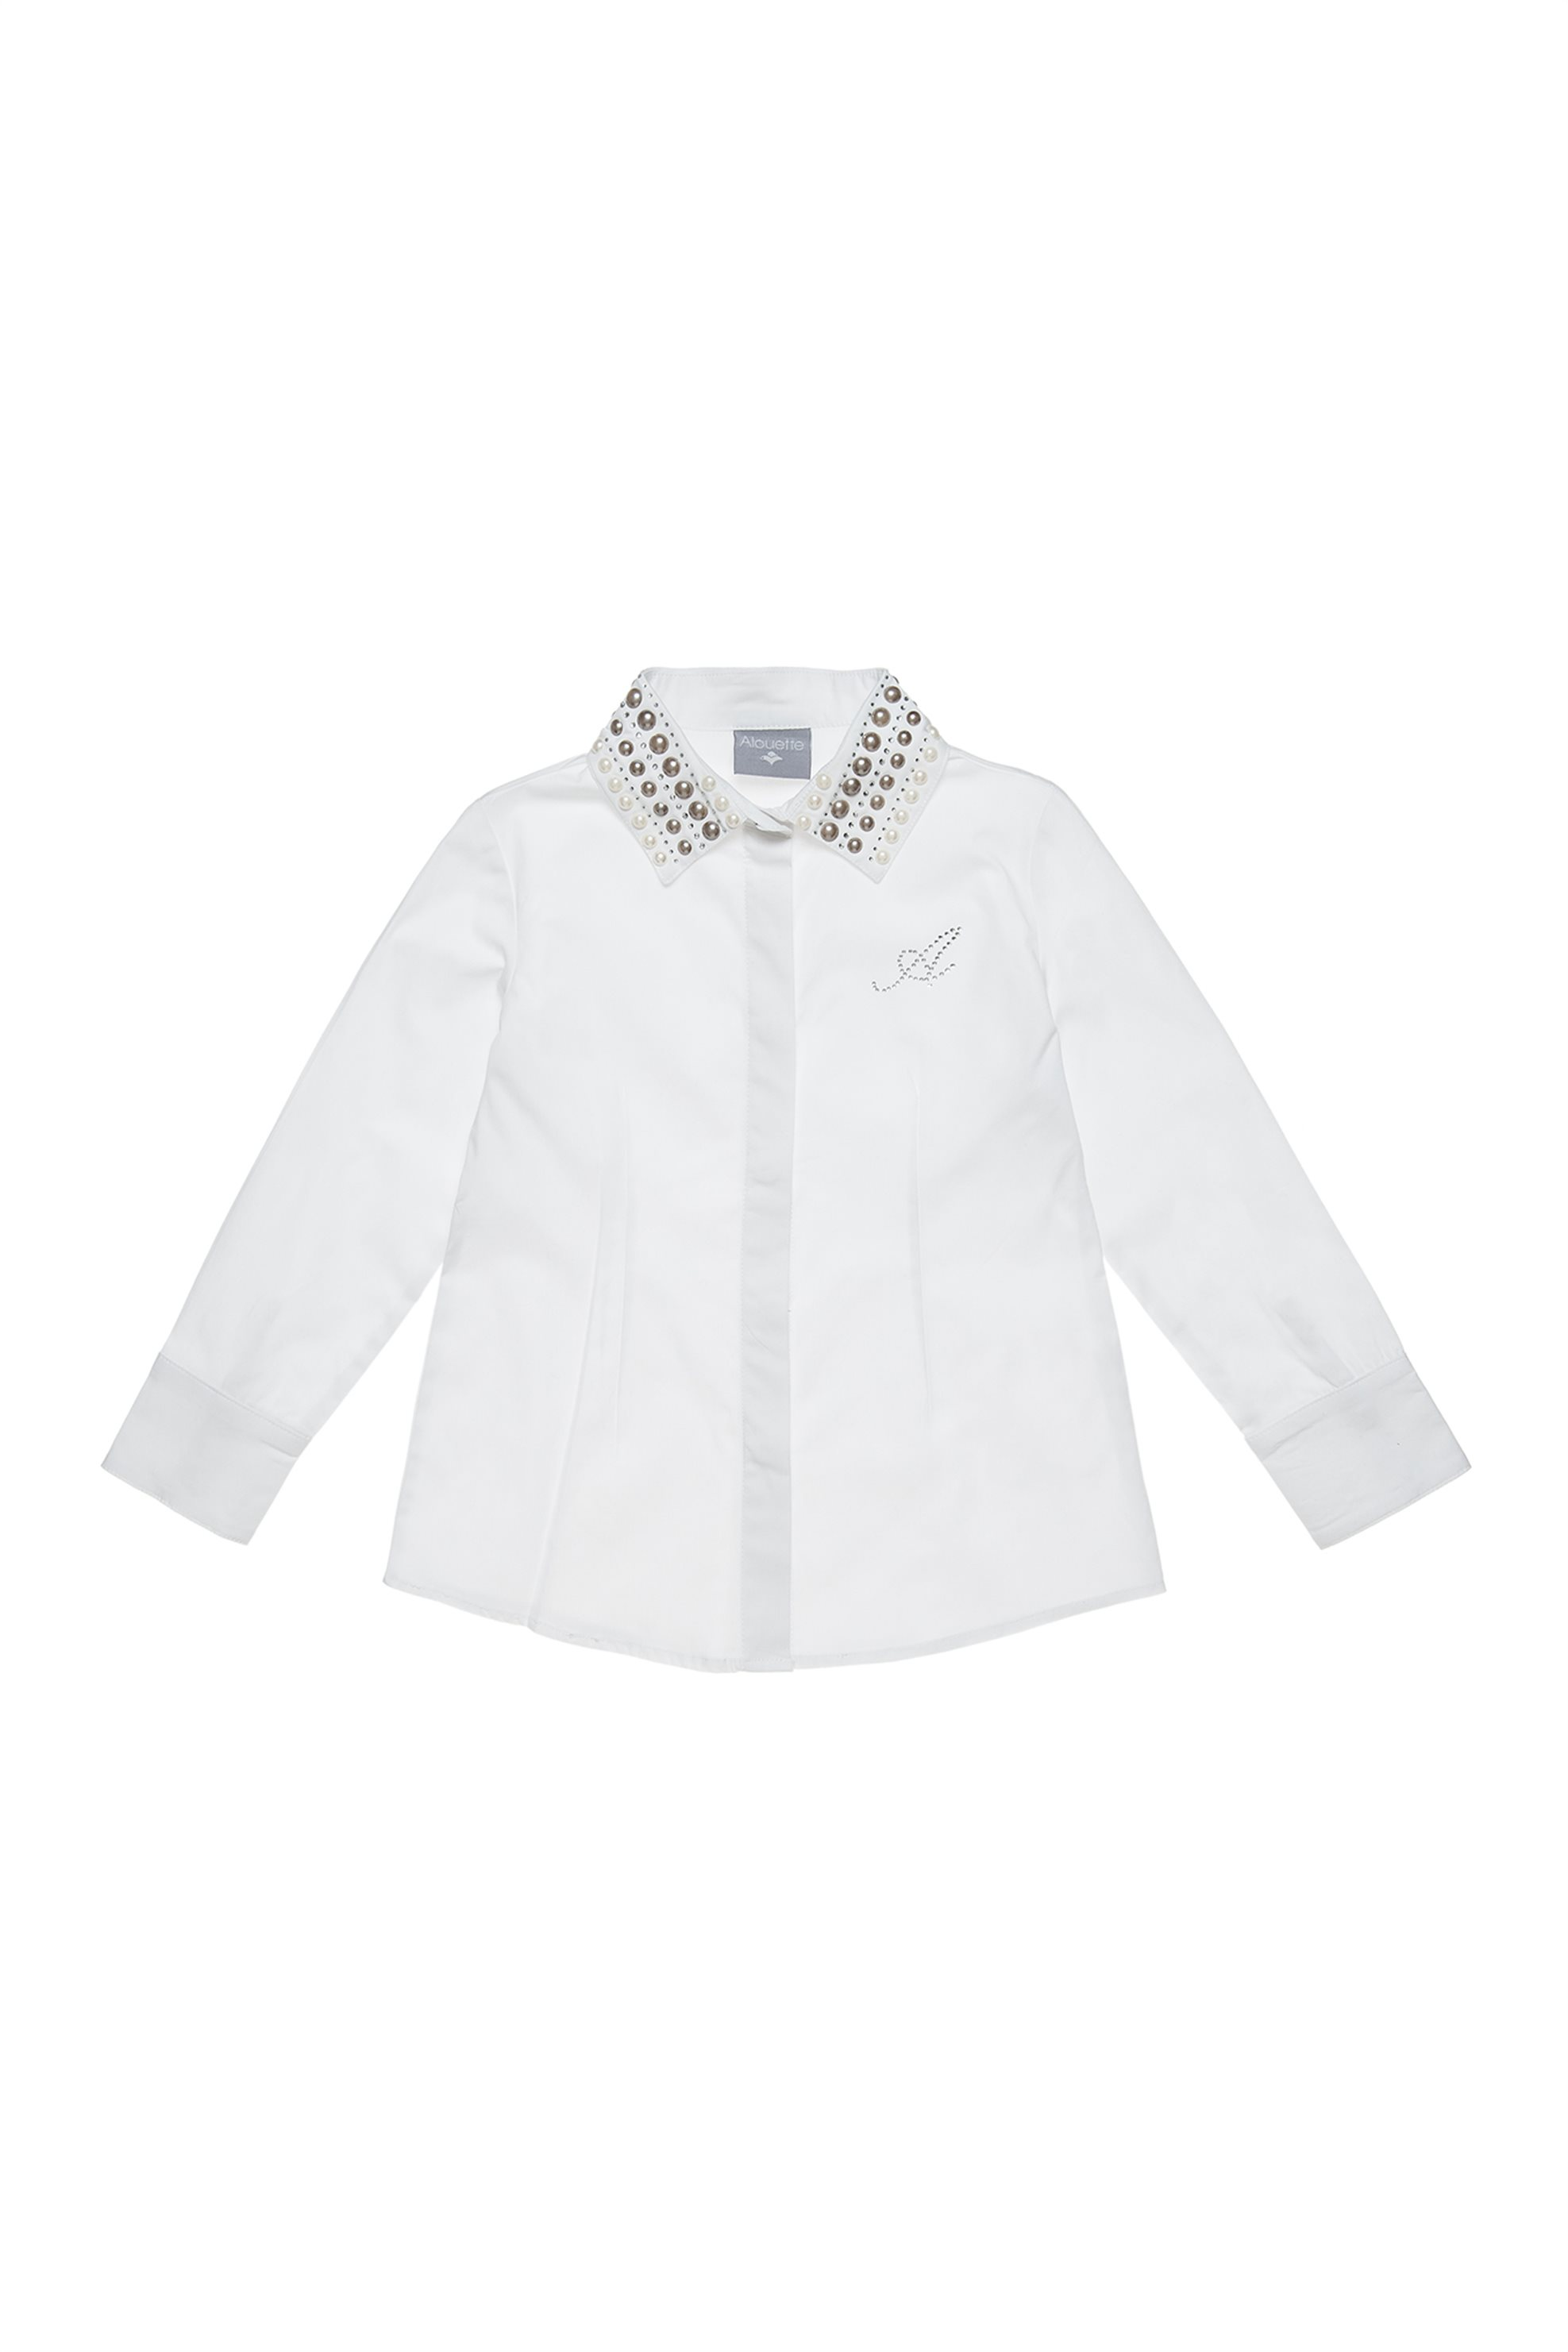 Alouette παιδικό πουκάμισο με πέρλες και στρας στον γιακά - 00922265 - Λευκό παιδι   κοριτσι   4 14 ετων   tops   παντελόνια   μπλούζες   πουκάμισα   πουκάμι